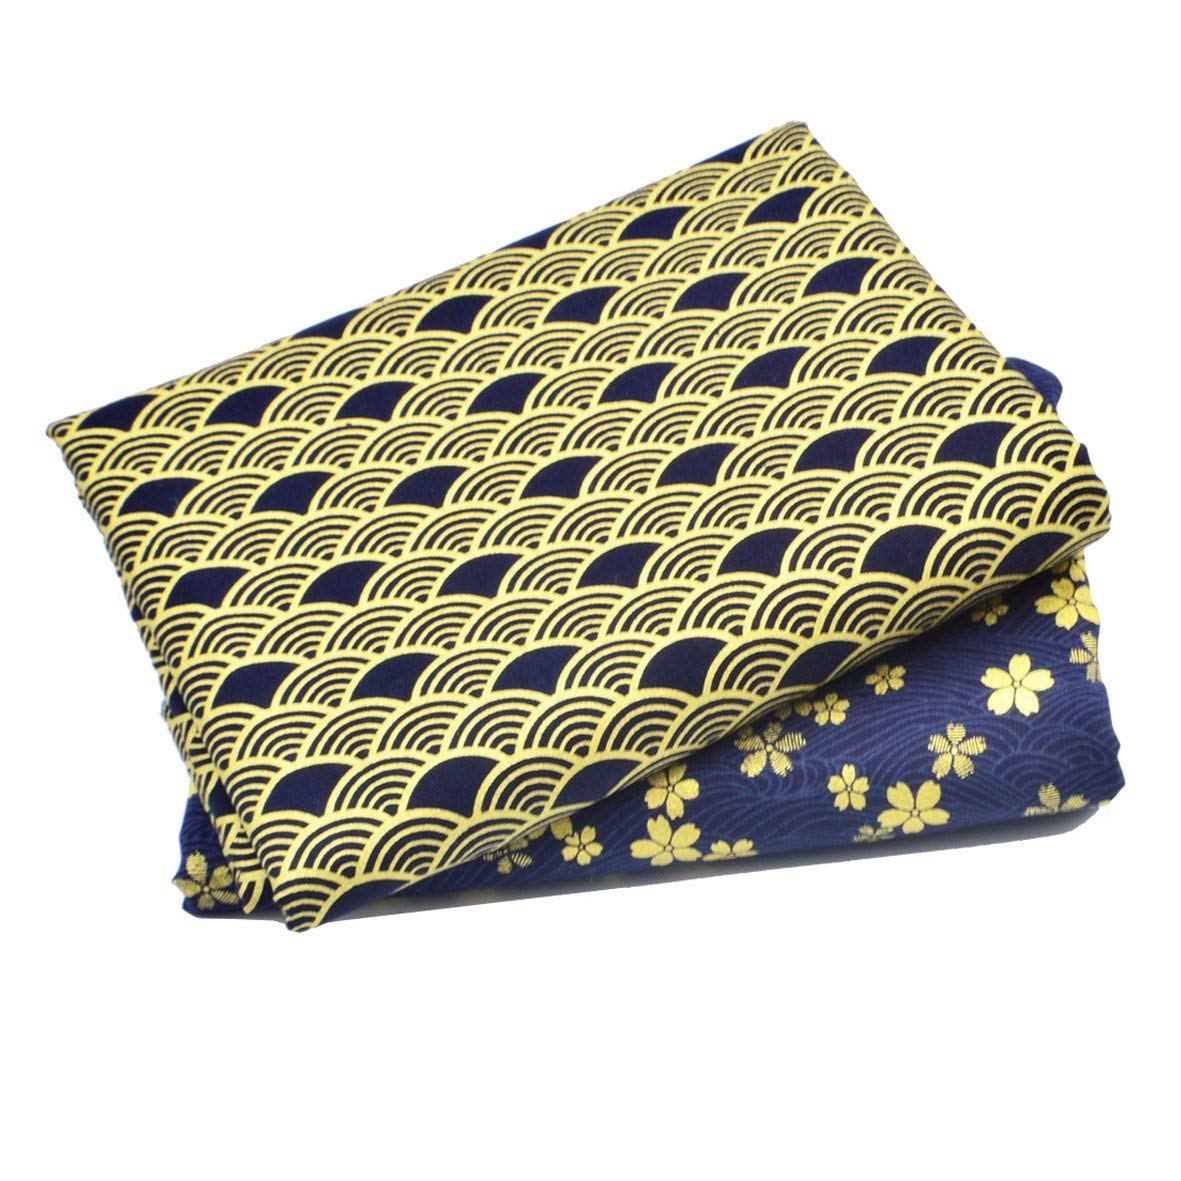 Sewing Quilting Fabric Indigo 18x22, iNee Japanese Sea Wave Fat Quarters Fabric Bundles